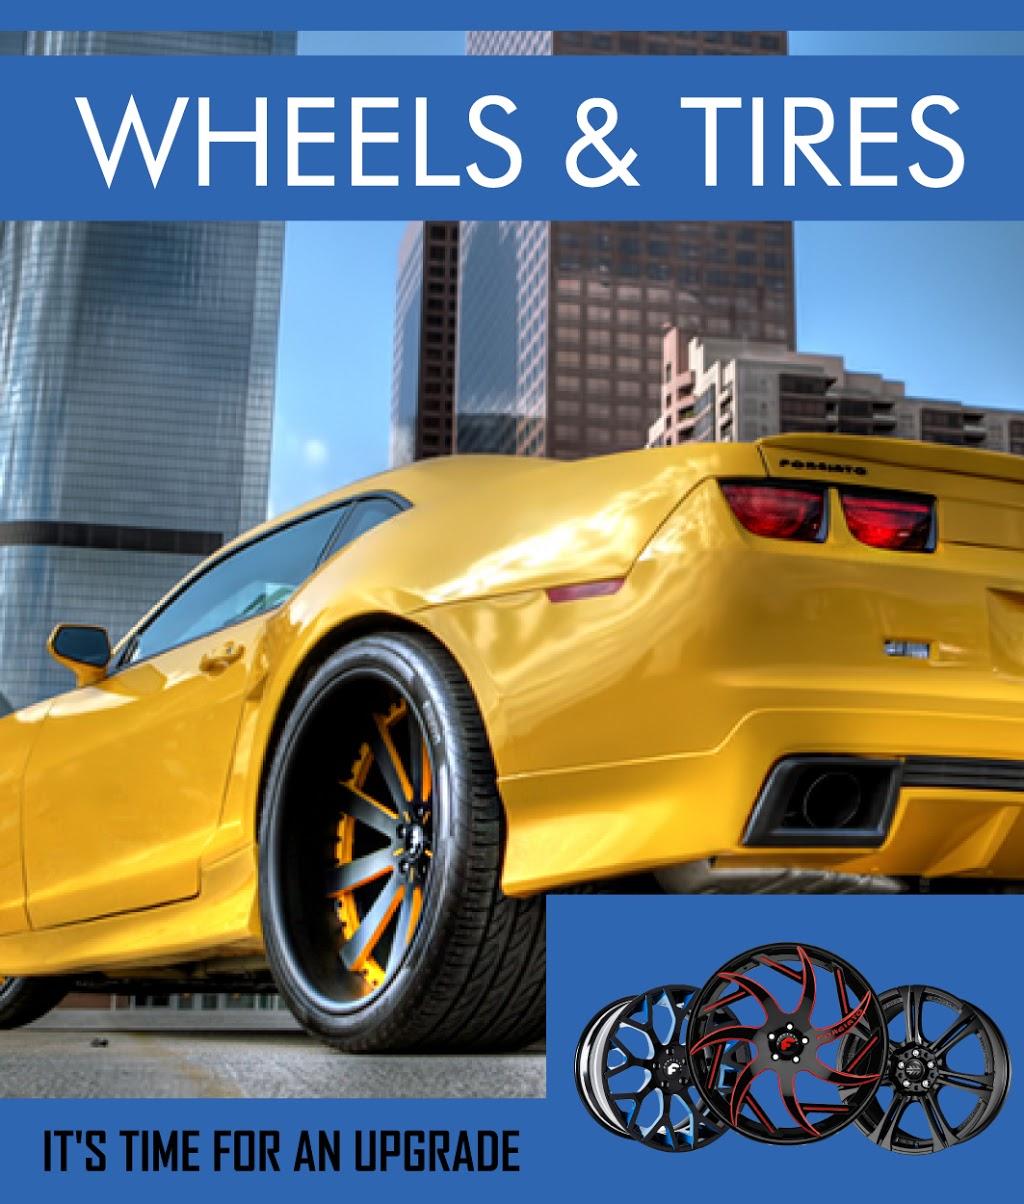 Livewire Customs - car repair  | Photo 5 of 10 | Address: 1309 W Texas St, Fairfield, CA 94533, USA | Phone: (707) 389-4969